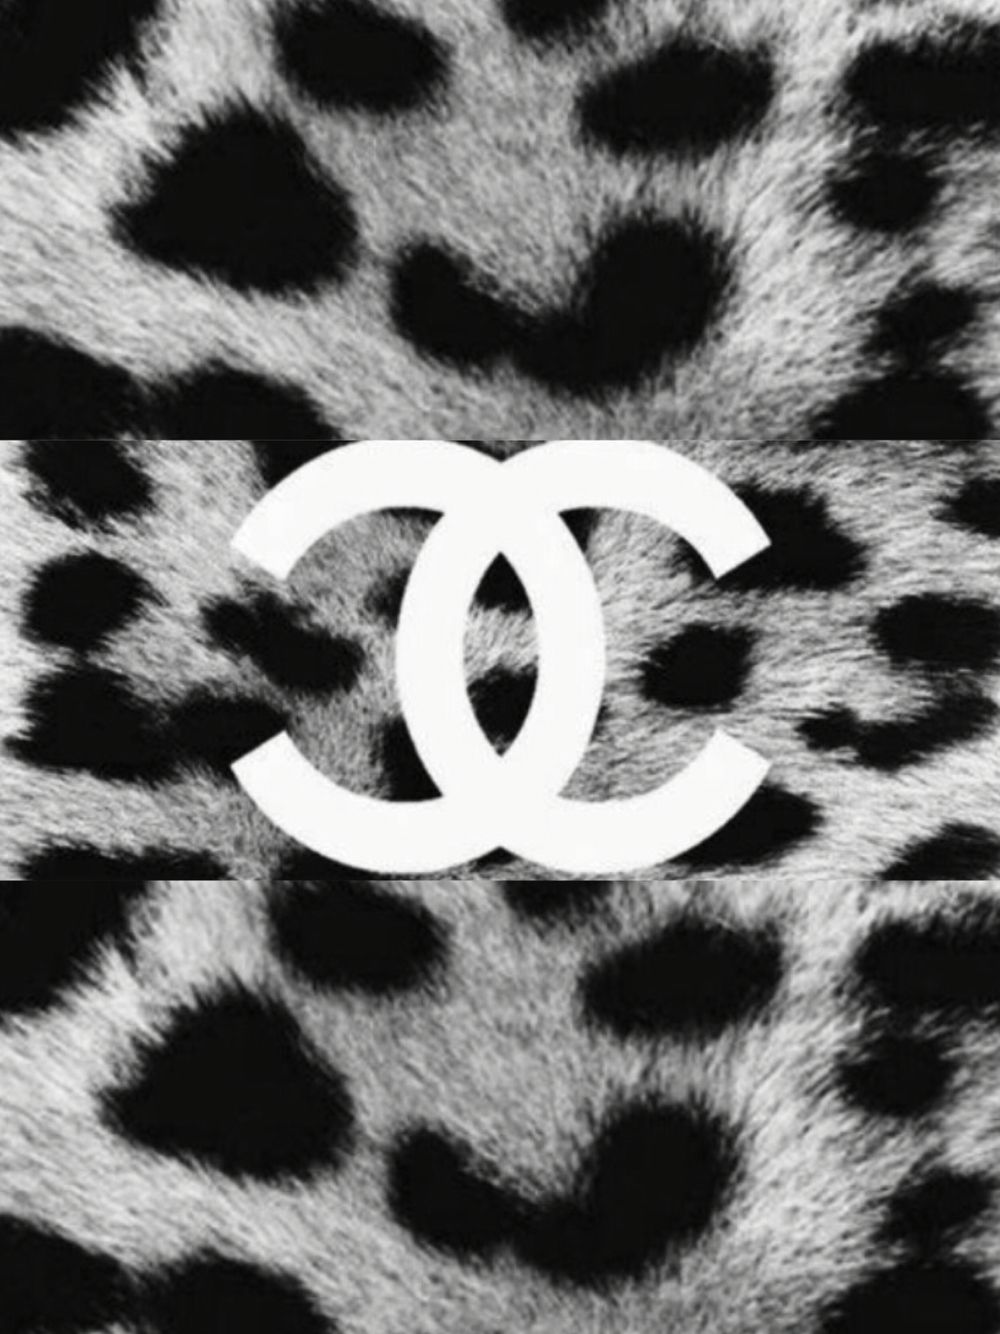 Chanel wallpaper Love it Wallpapers Pinterest Wallpaper